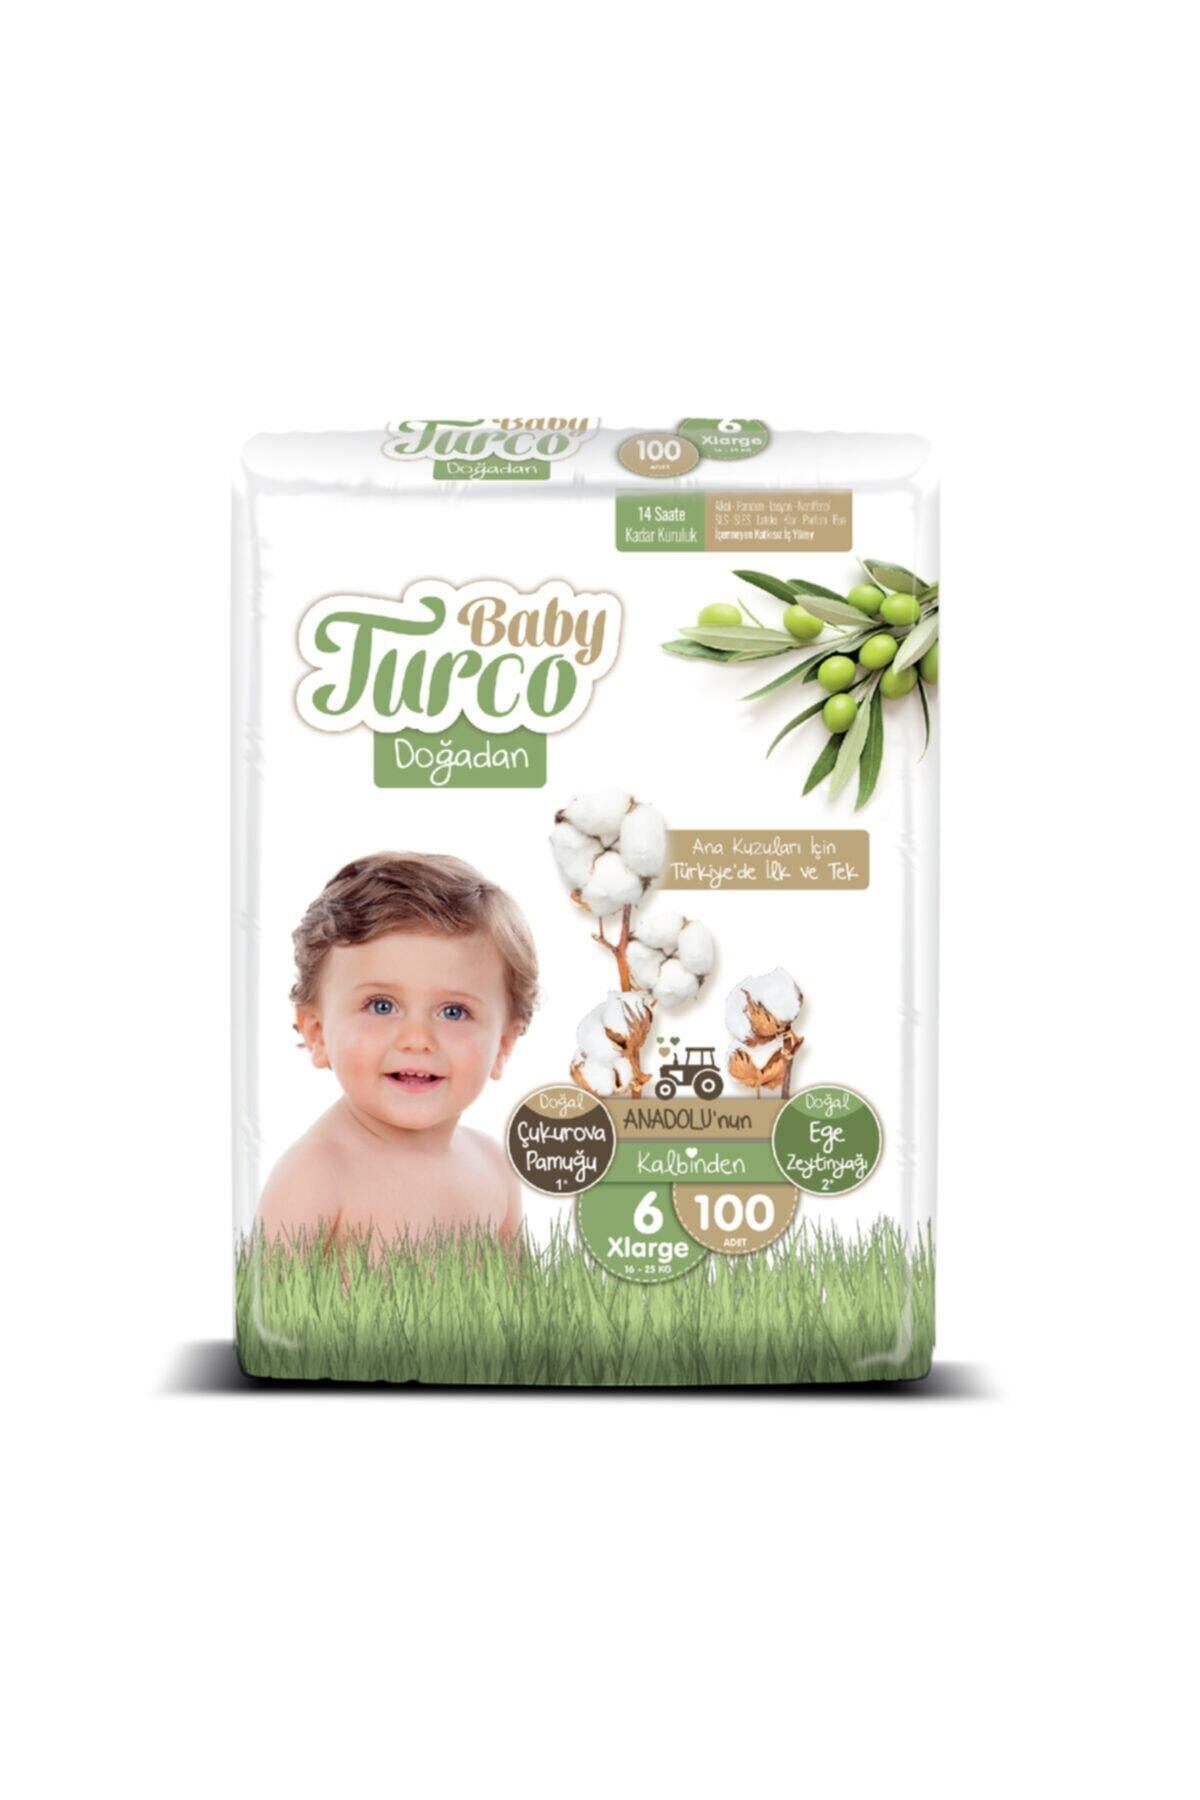 Baby Turco Doğadan 6 Numara Xlarge 100 Adet 2